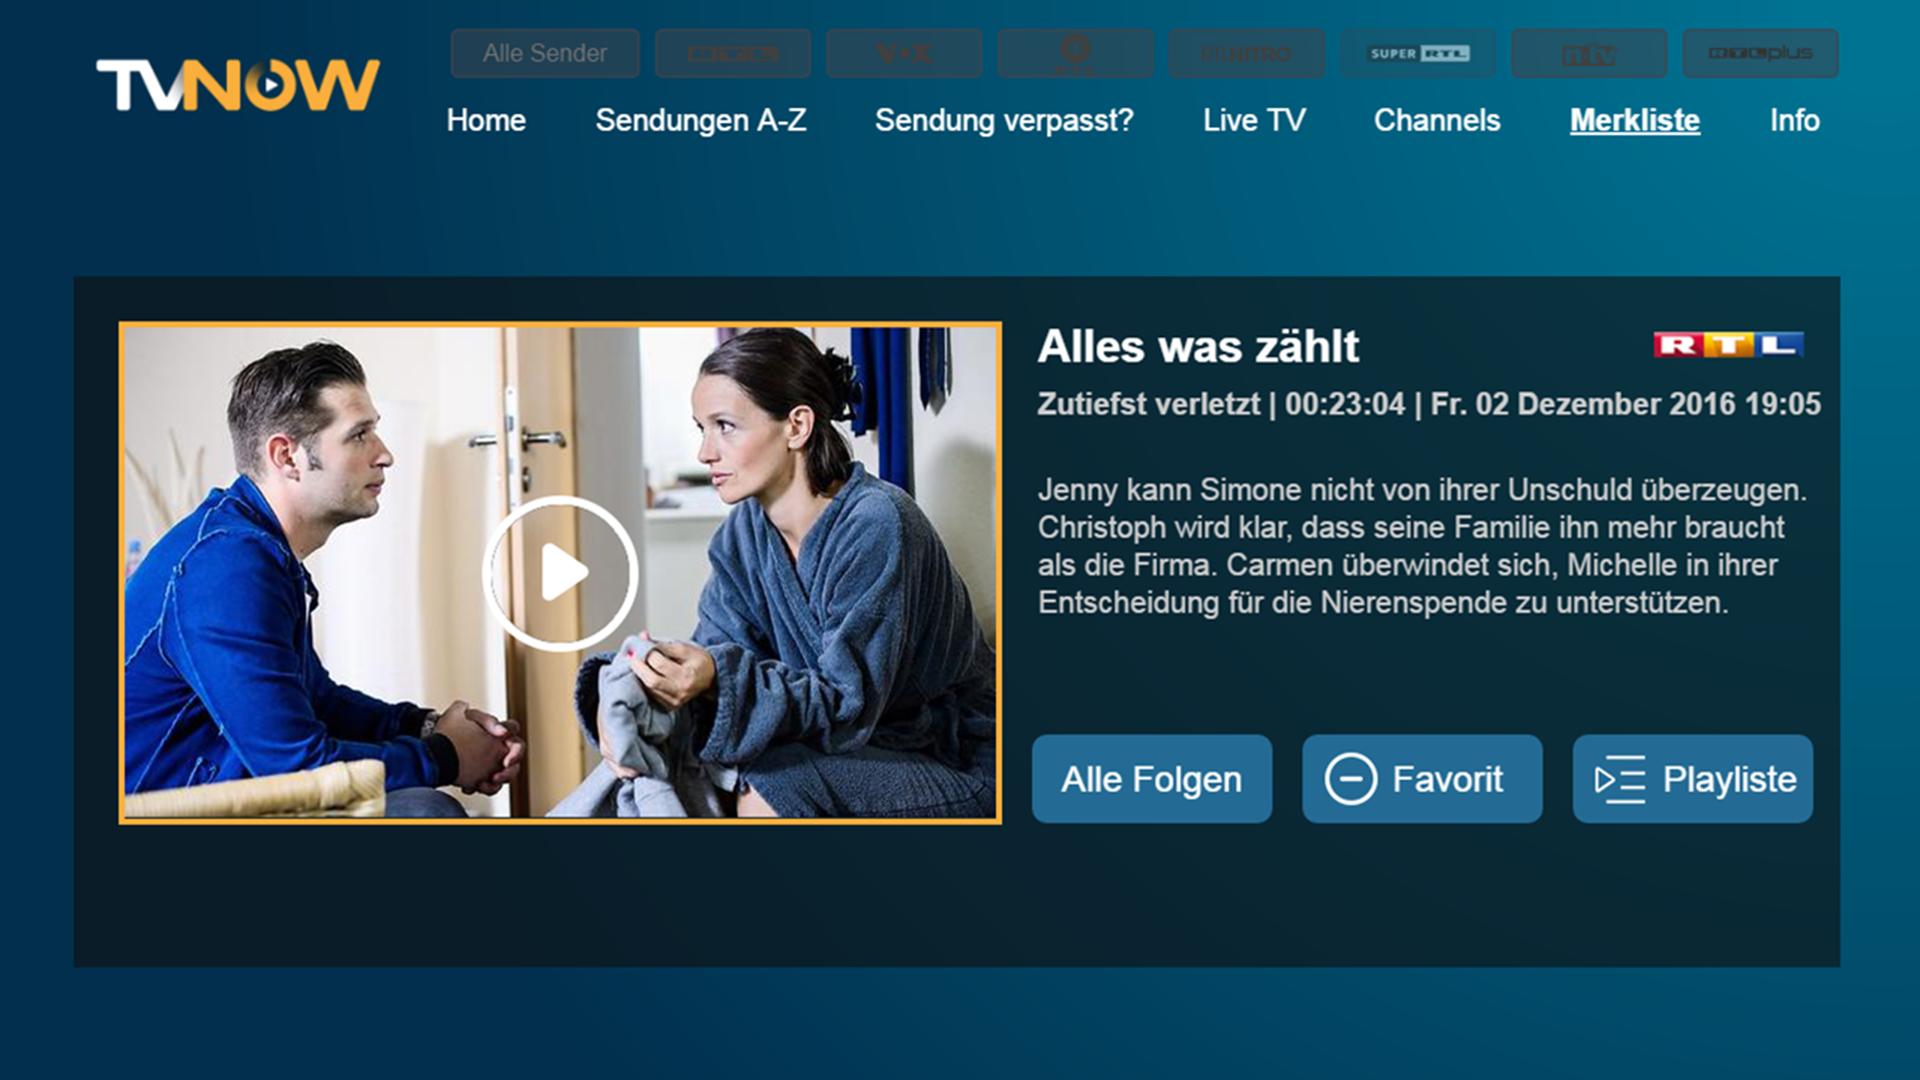 Tv now rtl mediathek ab sofort f r fire tv verf gbar for Rtl spiegel tv mediathek